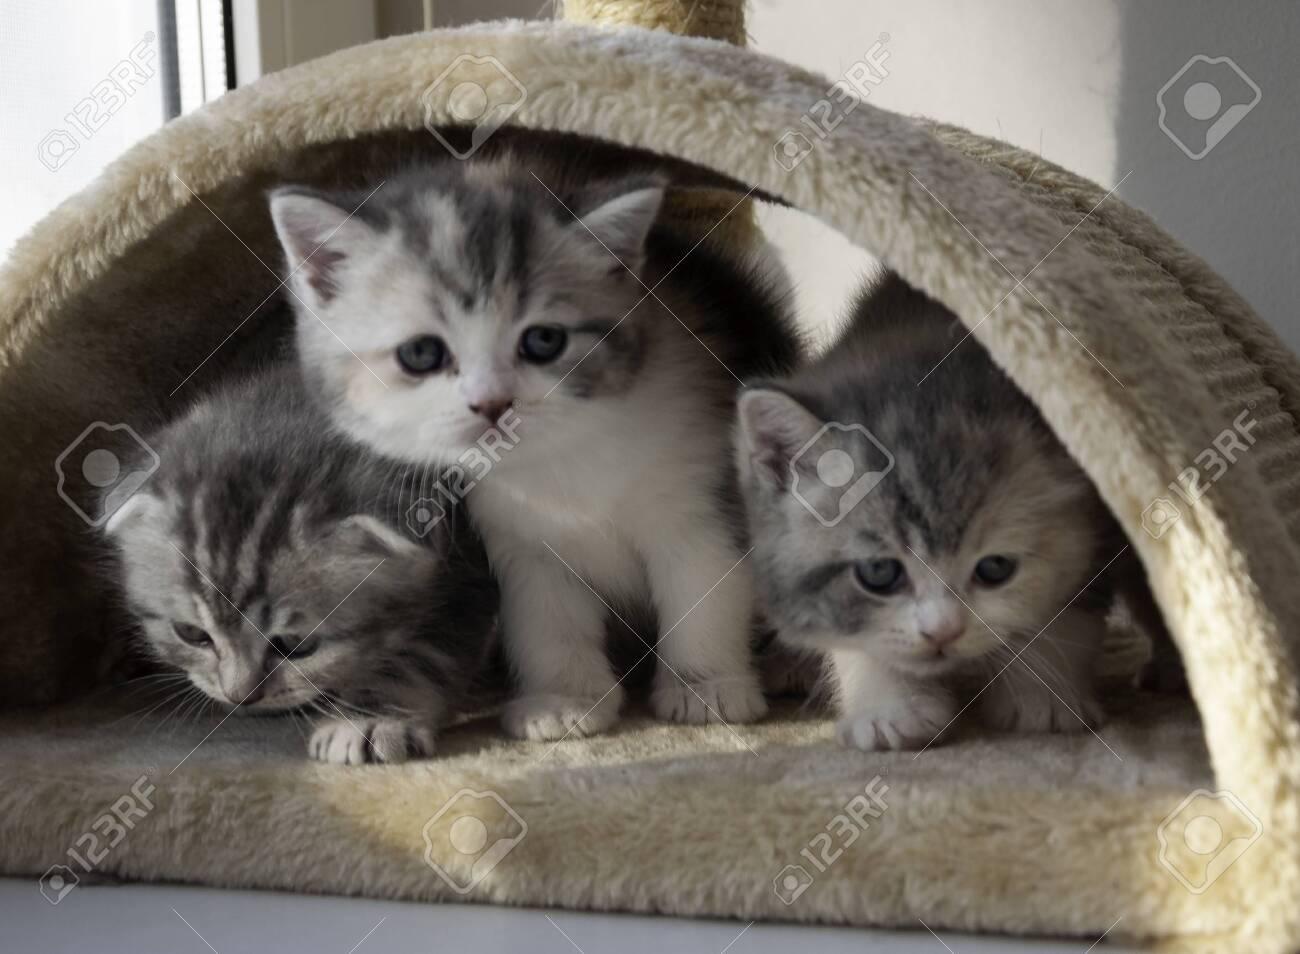 various british kittens sitting on beige plaid - 151084528